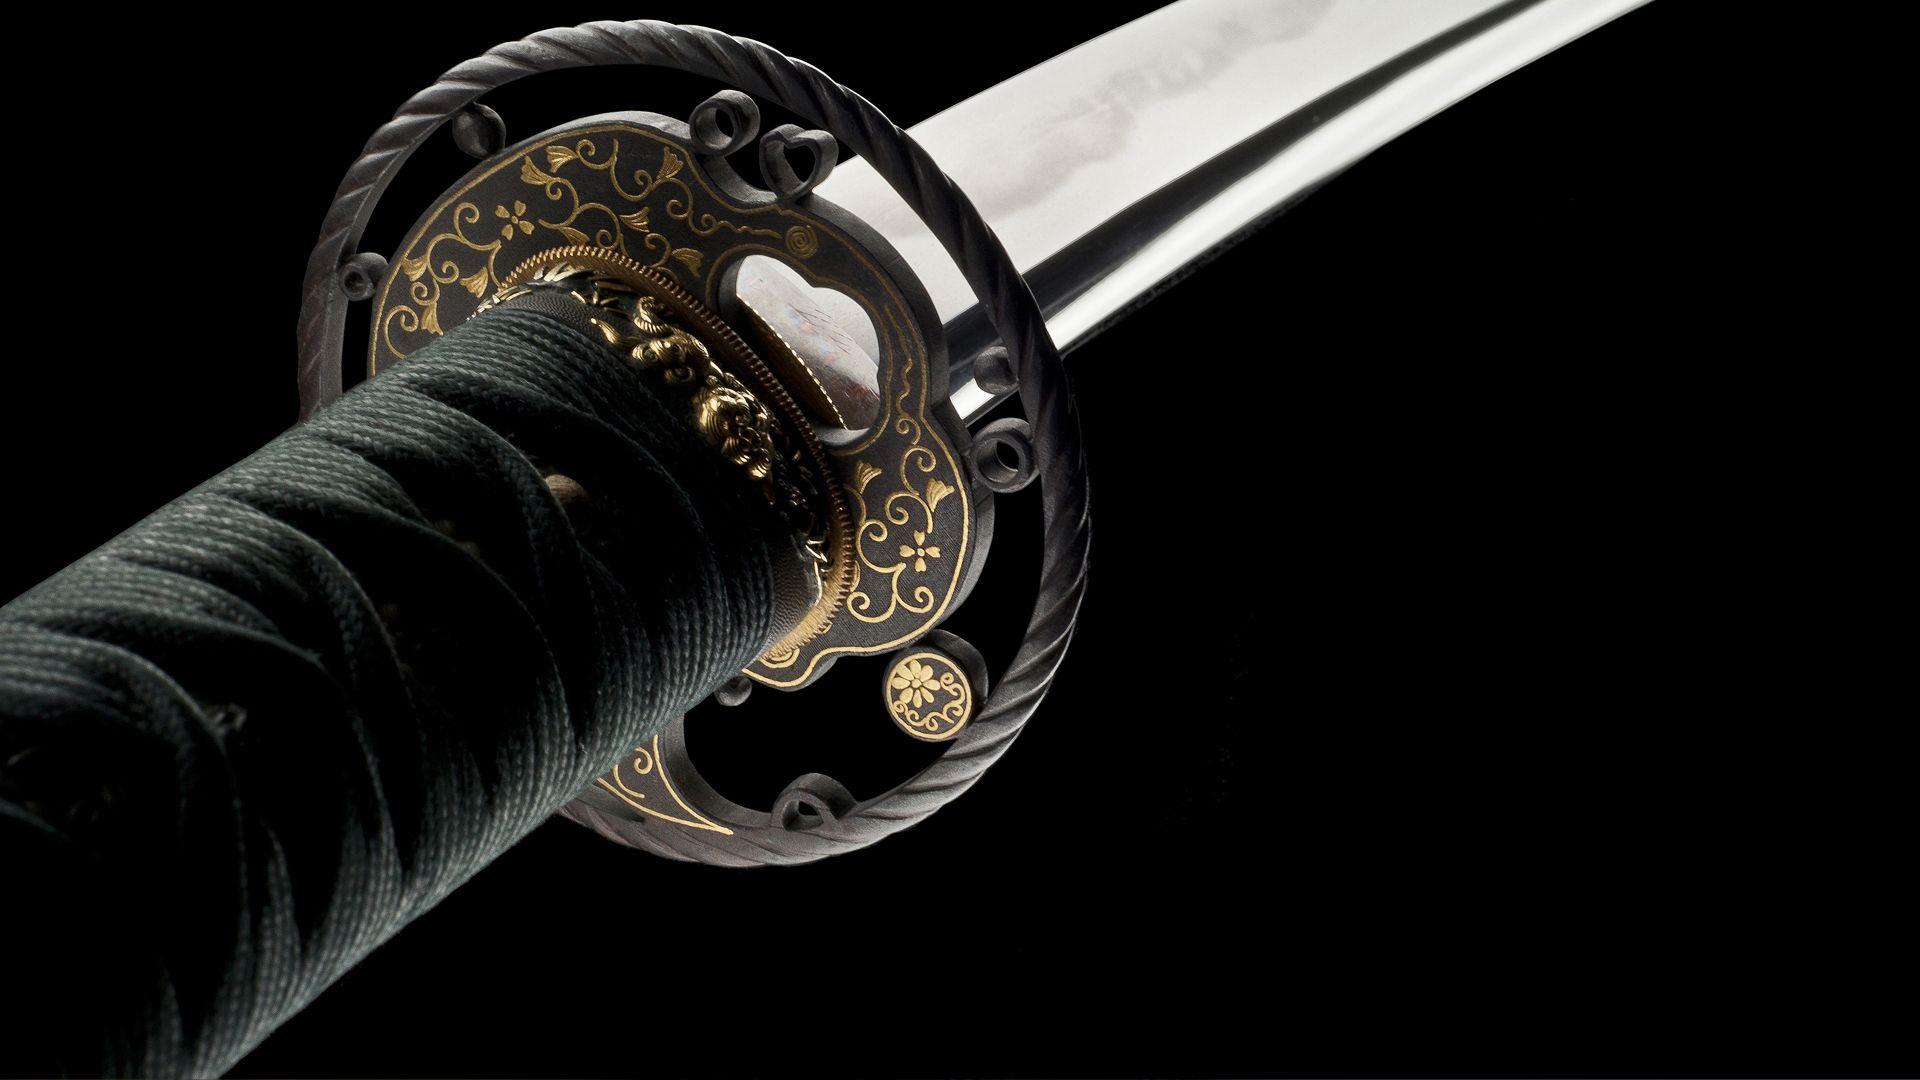 Sword High Quality